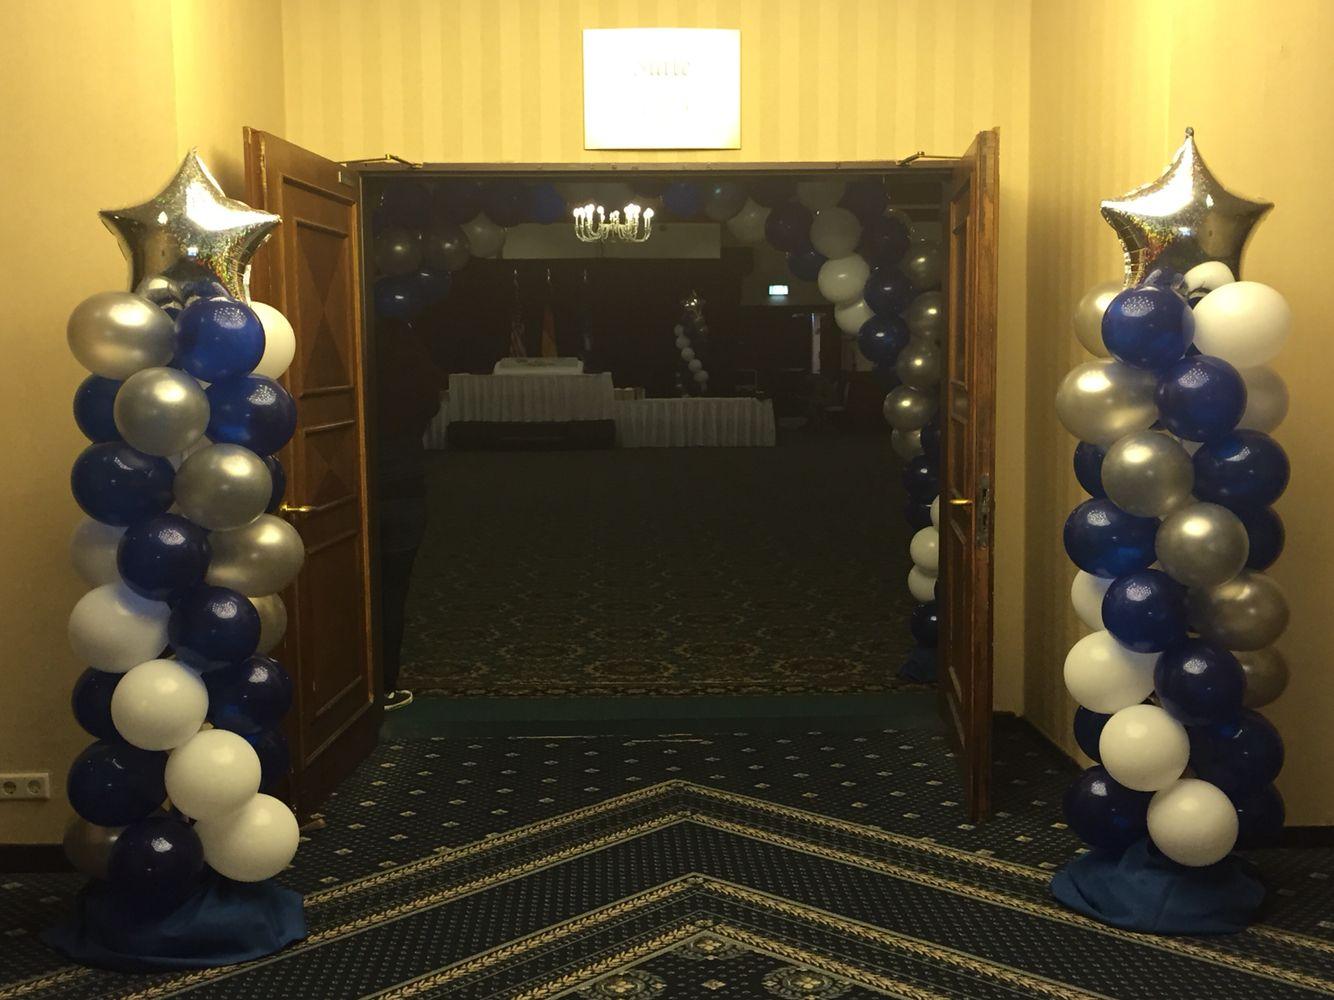 White, blue, and silver balloon columns Dallas cowboys